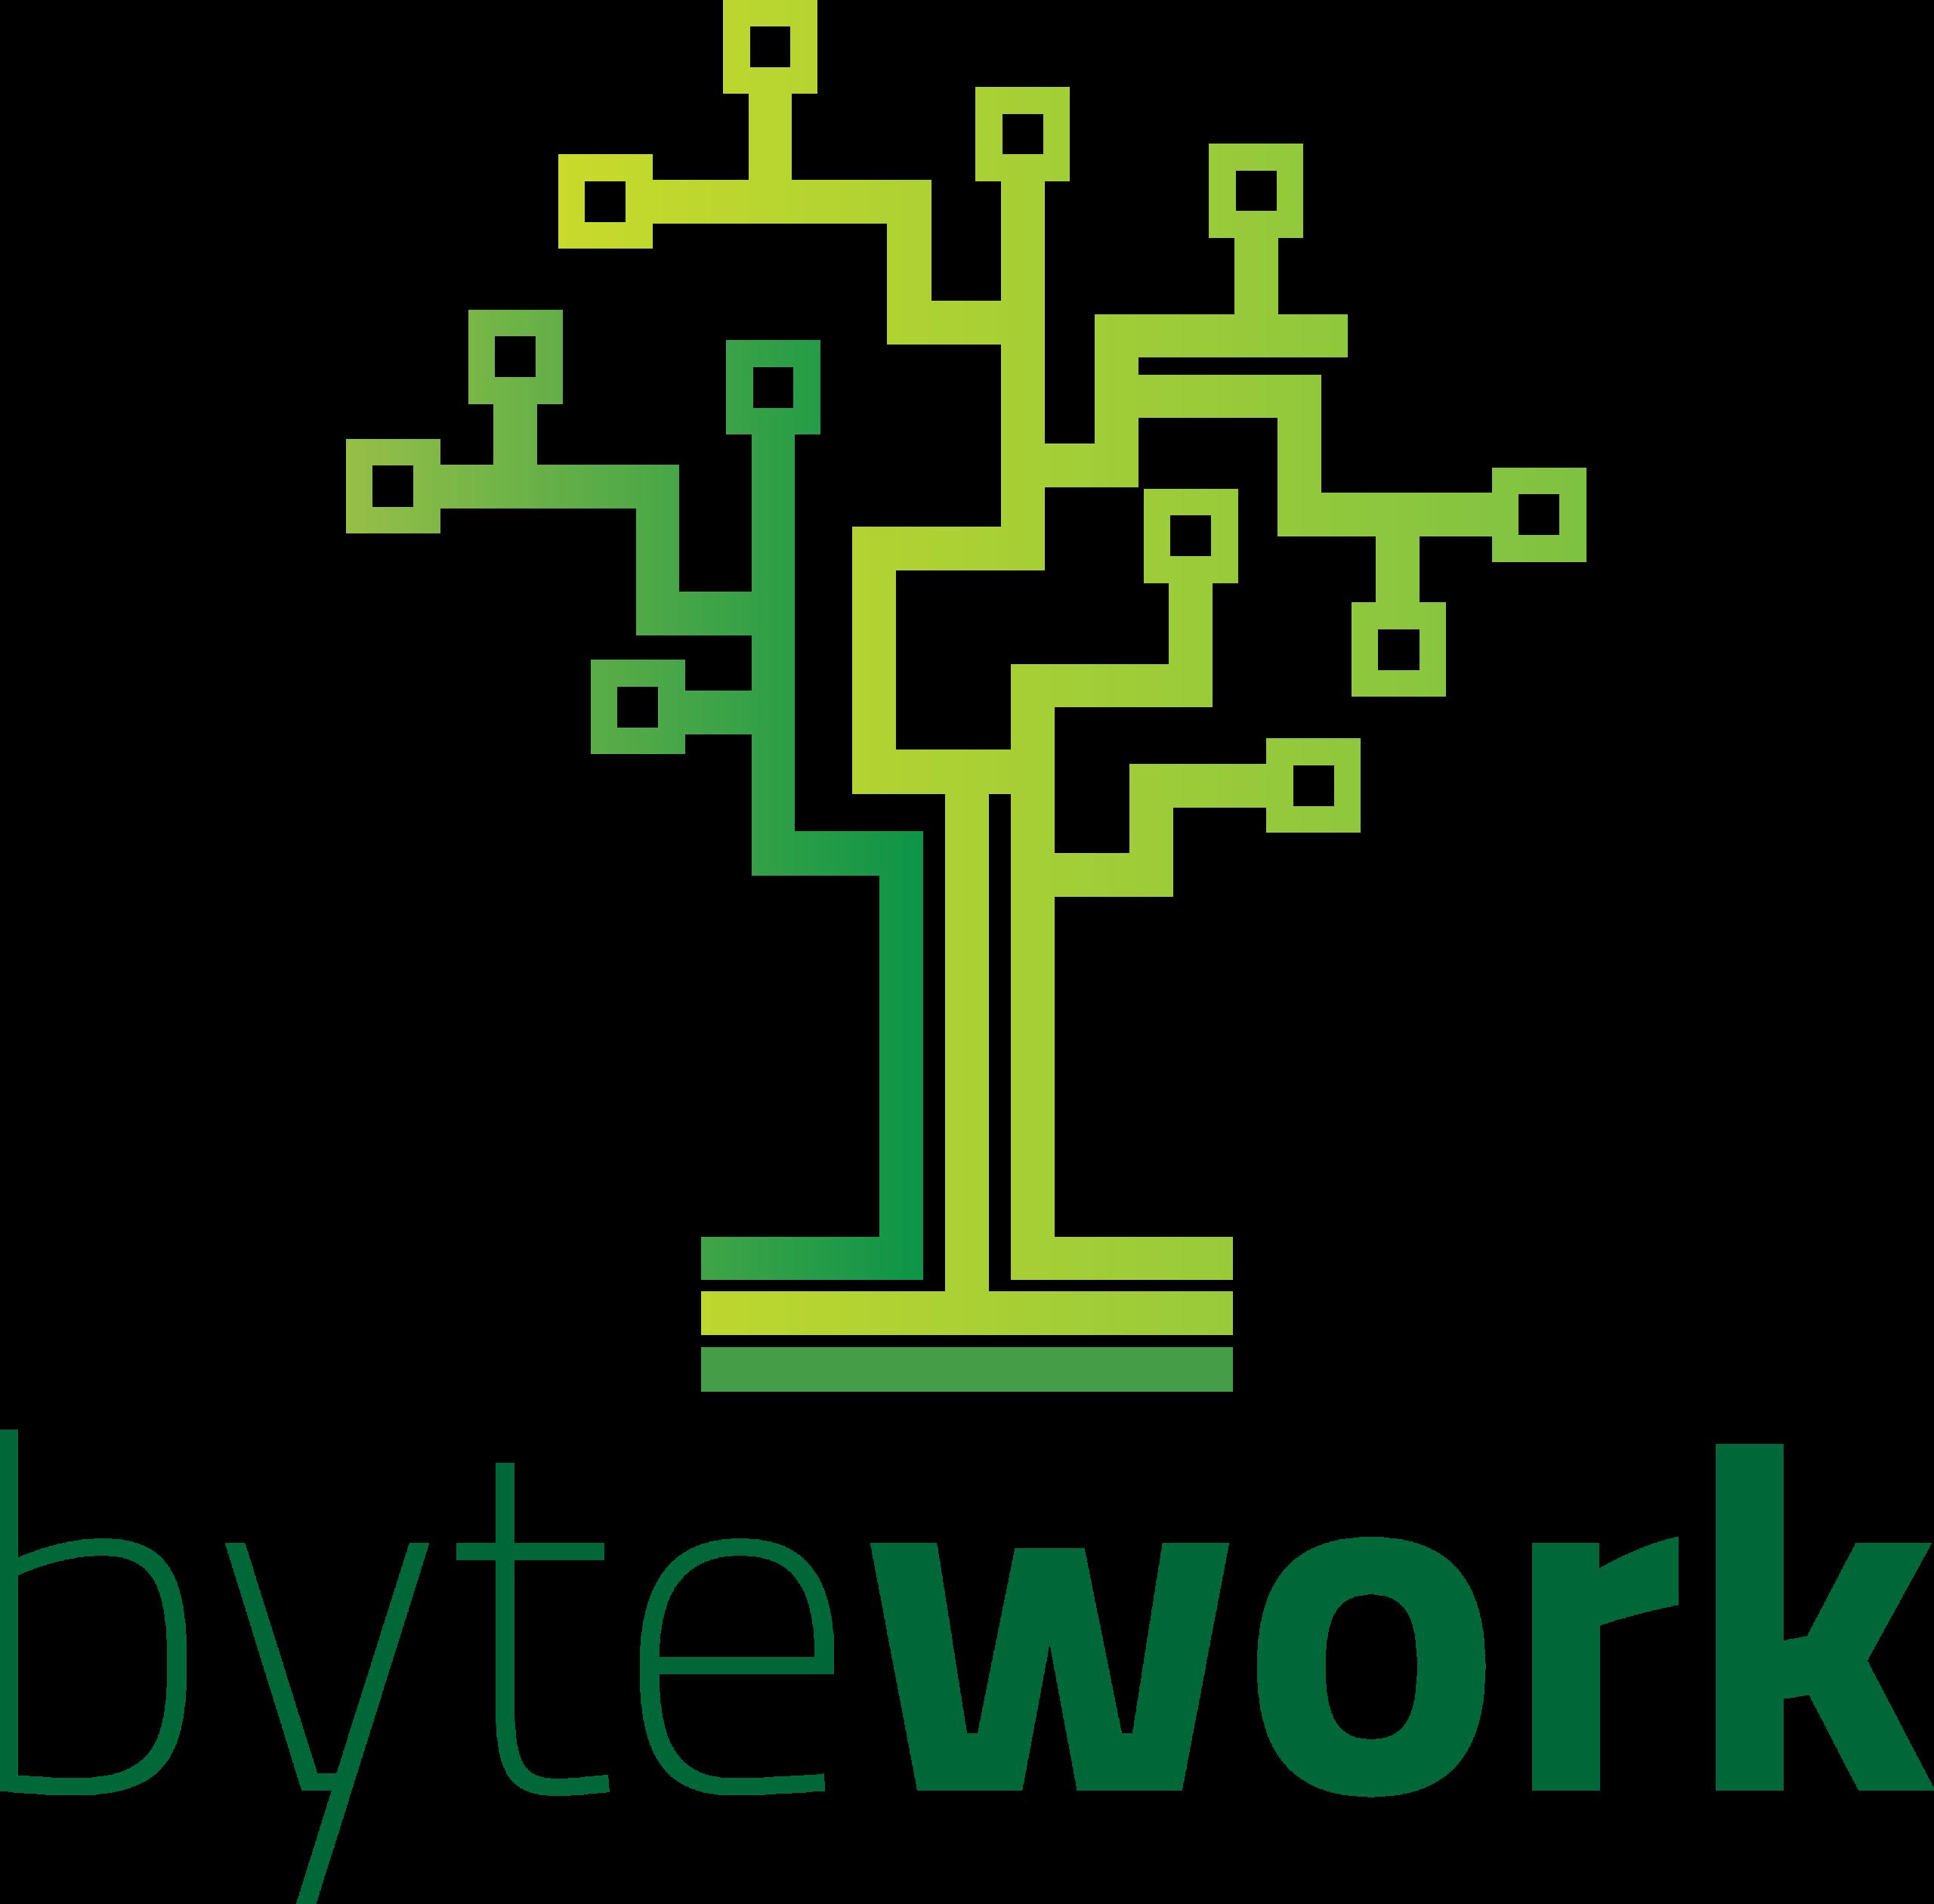 ByteWork